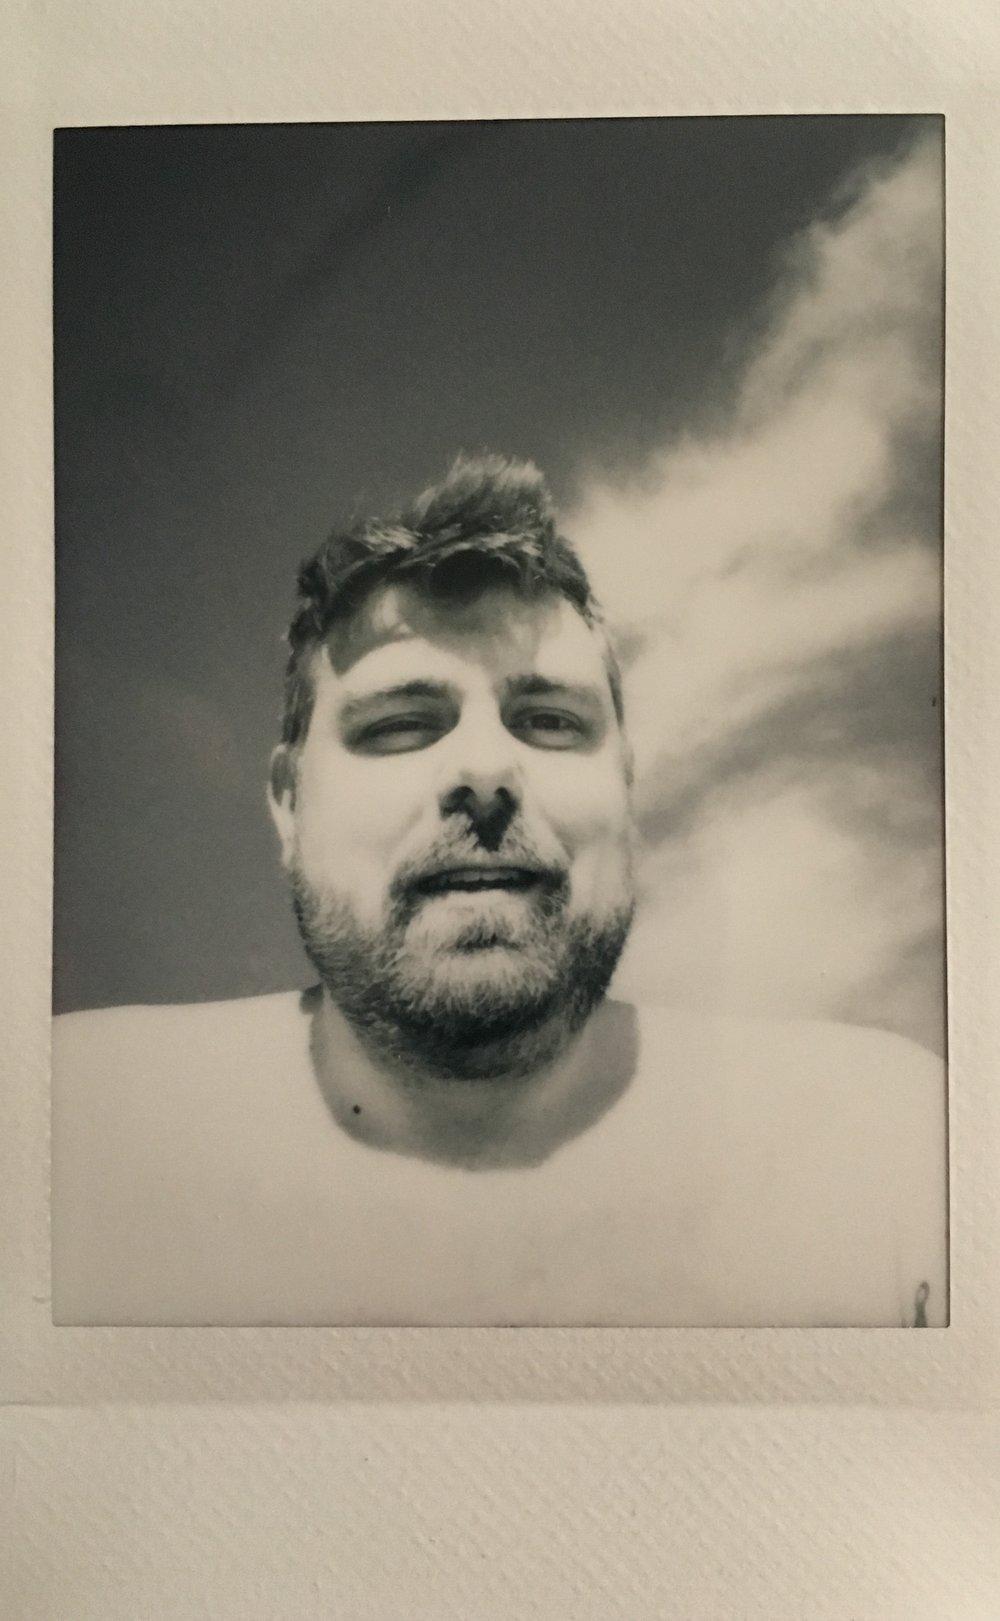 Instamax Monochrome Selfie